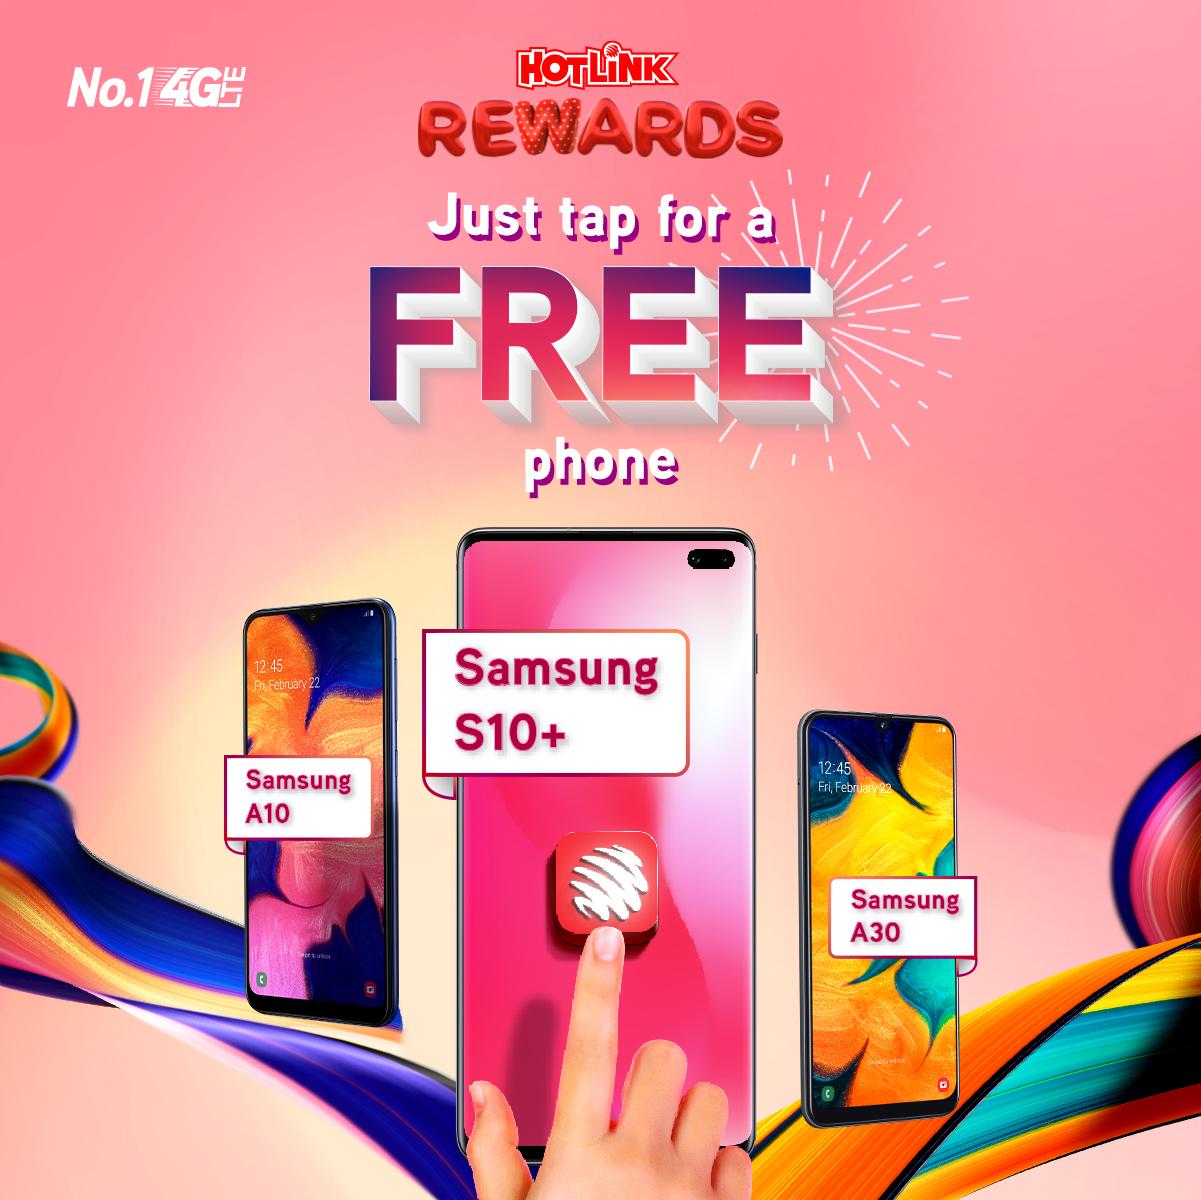 Hotlink Rewards - Free Phones Every Day